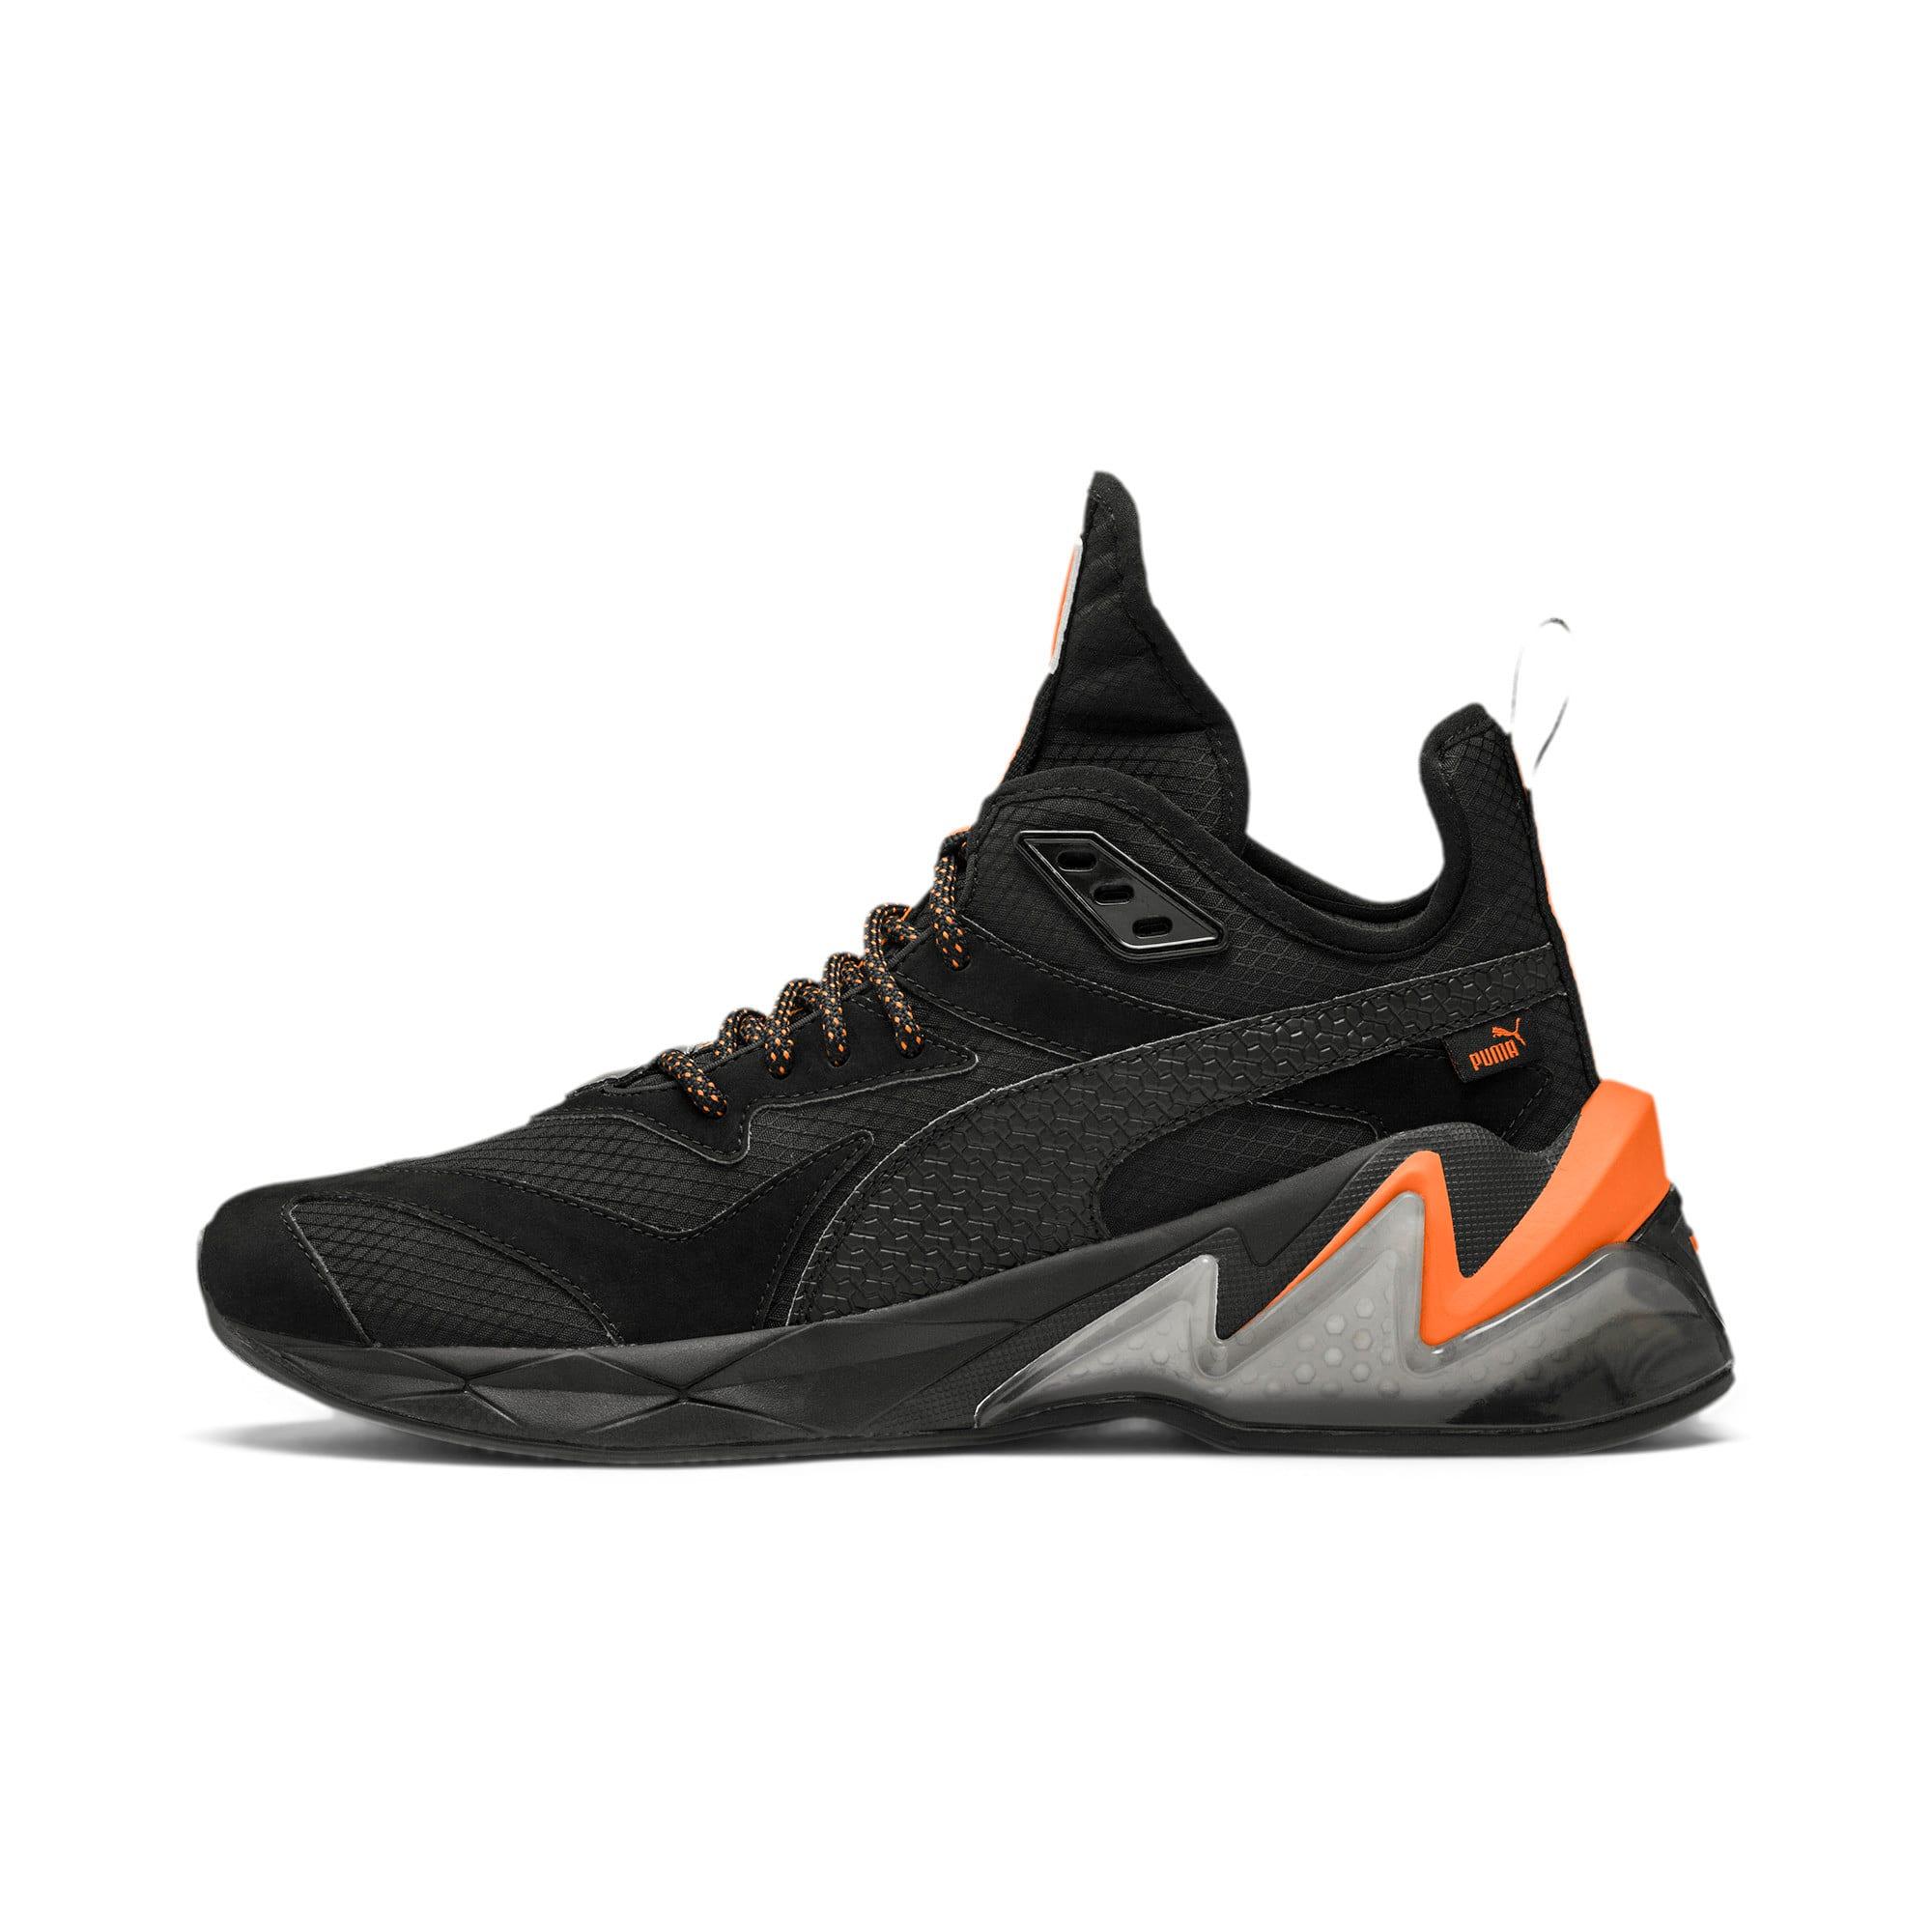 Thumbnail 1 of LQDCELL Origin Terrain Men's Training Shoes, Puma Black-Jaffa Orange, medium